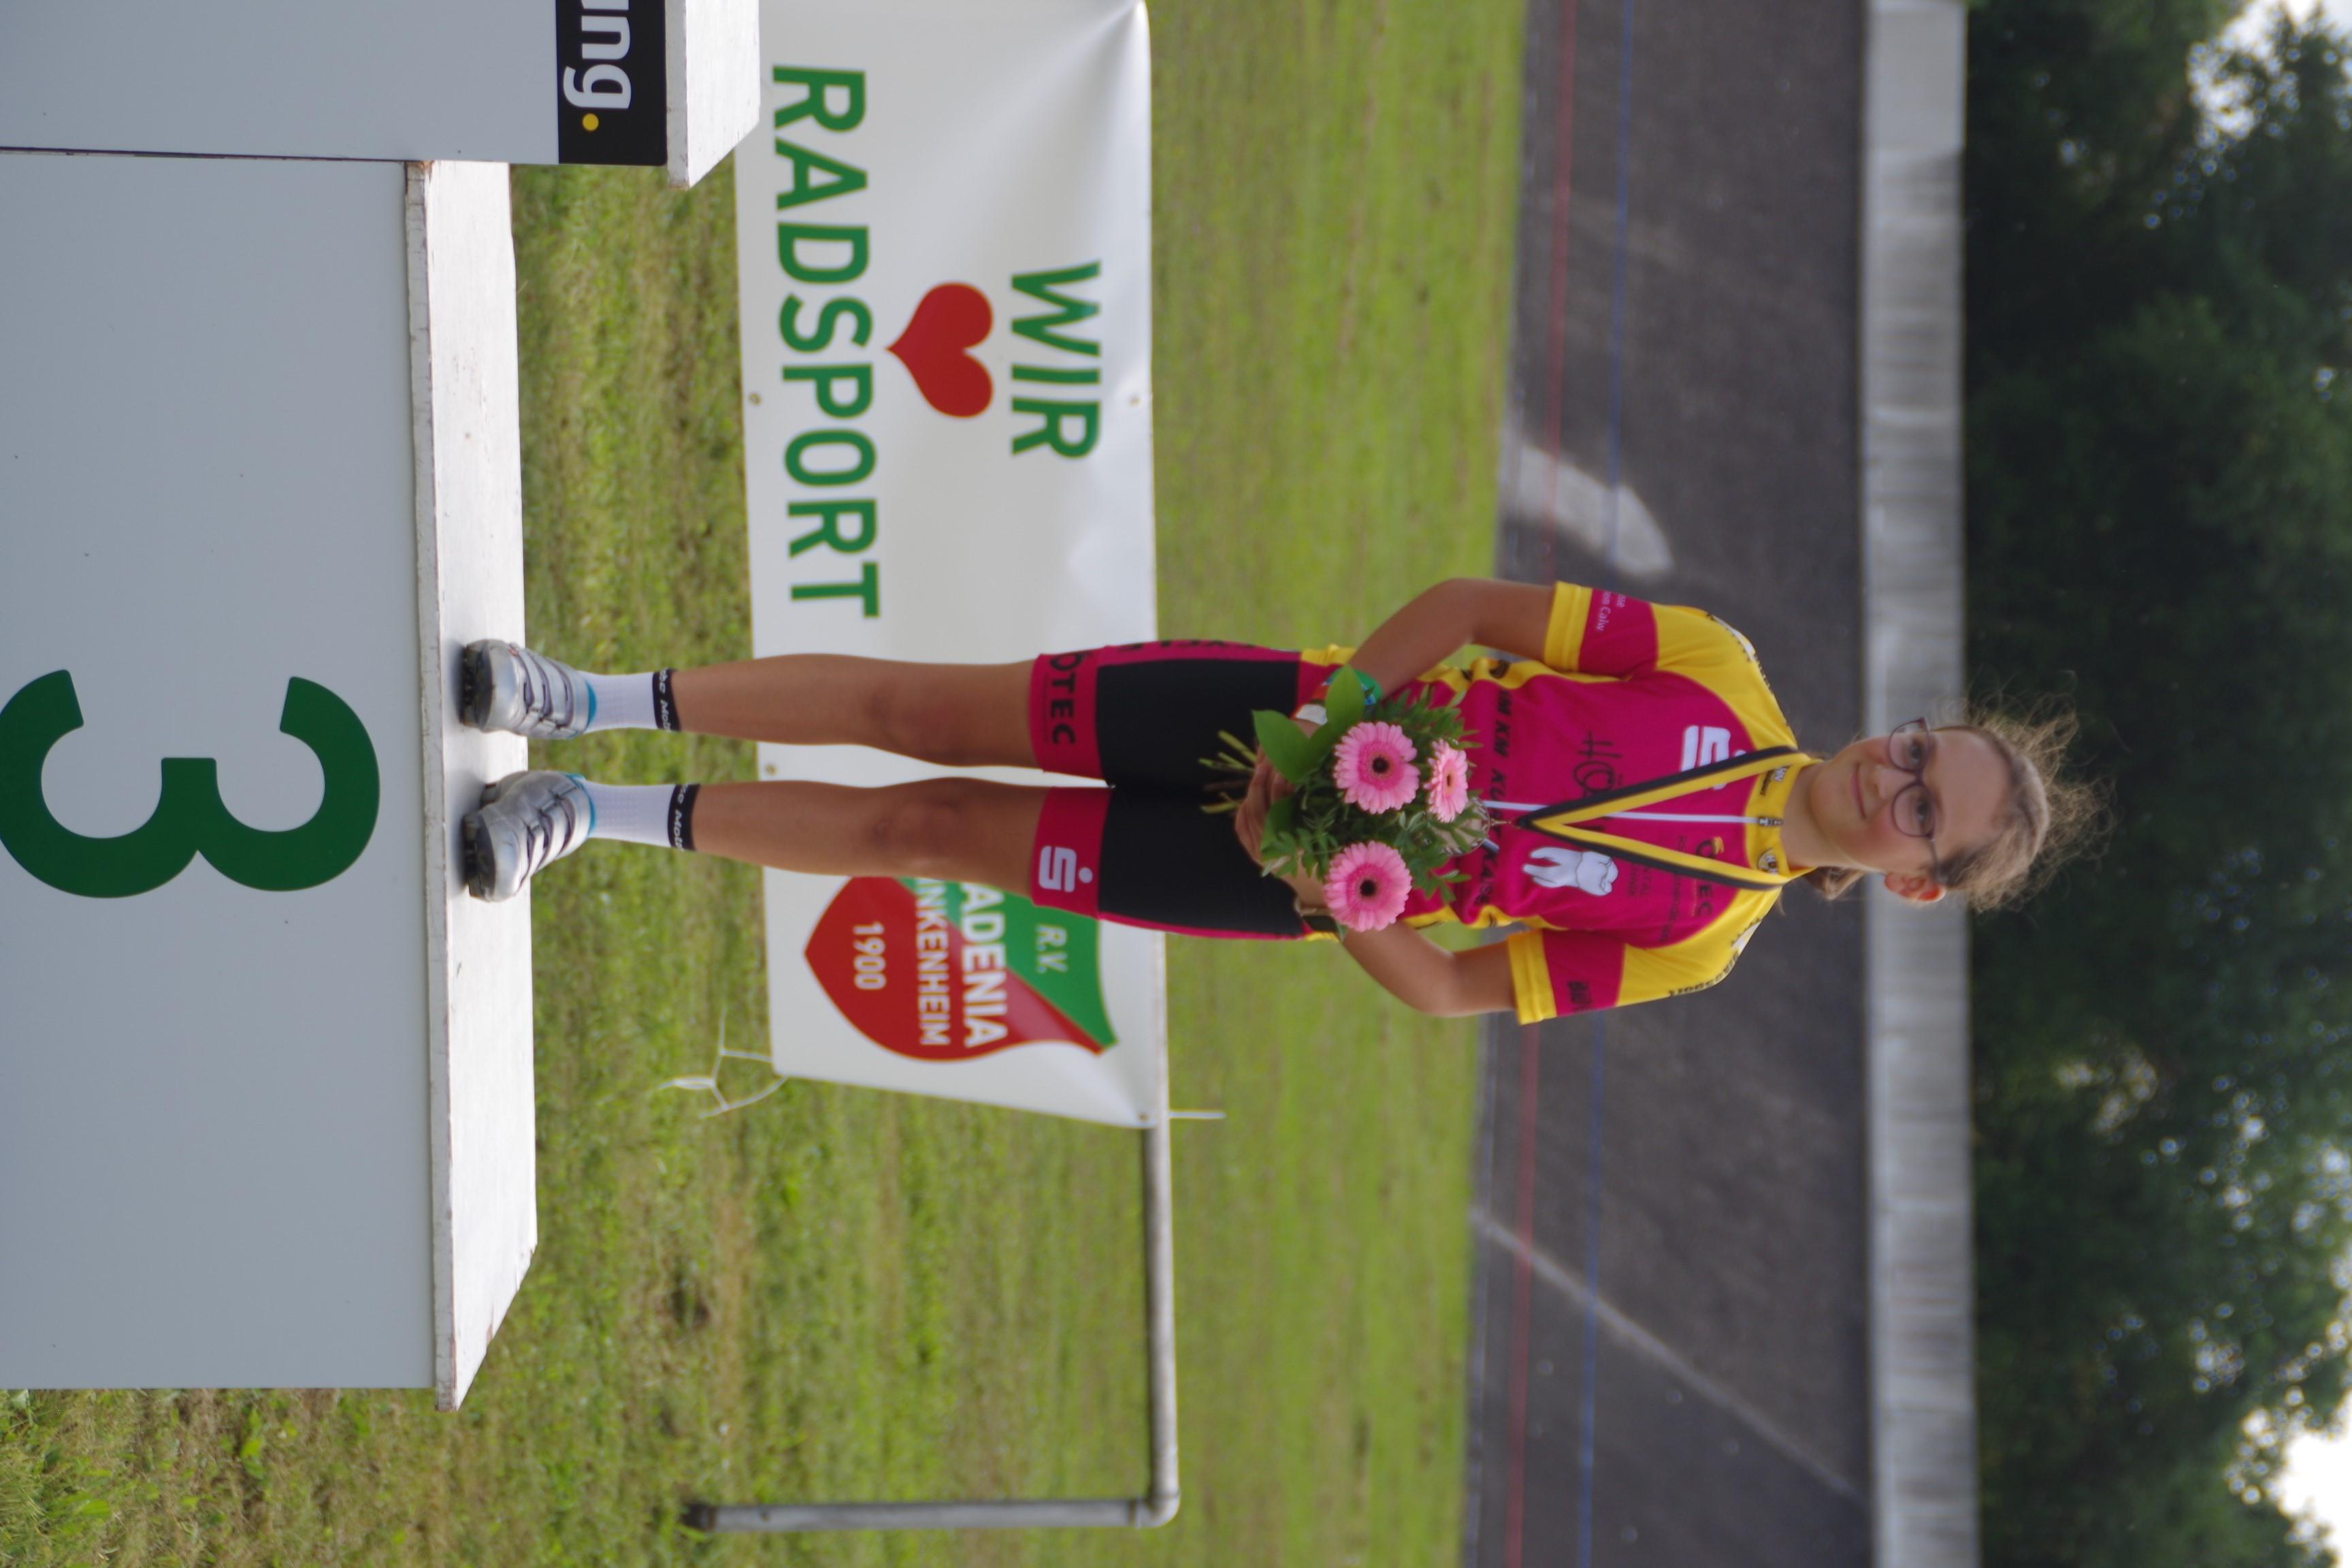 Lena Deschner Platz 3 bei den Landesmeisterschaften